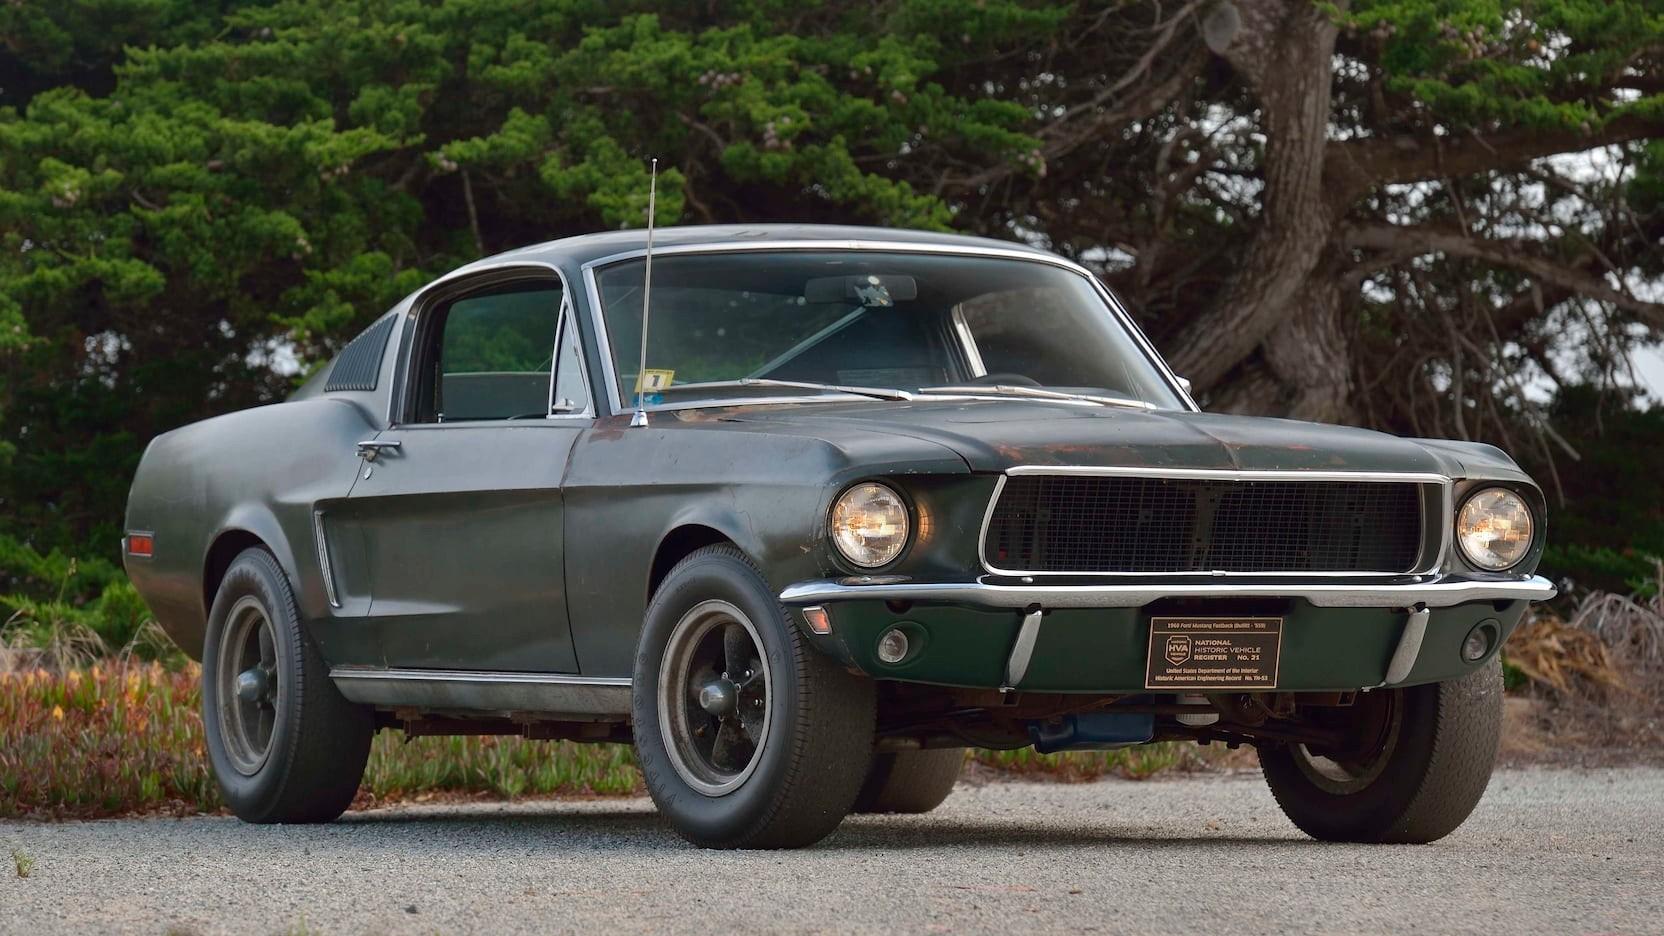 Ford-Mustang-GT-1968-From-Bullitt-auction-5